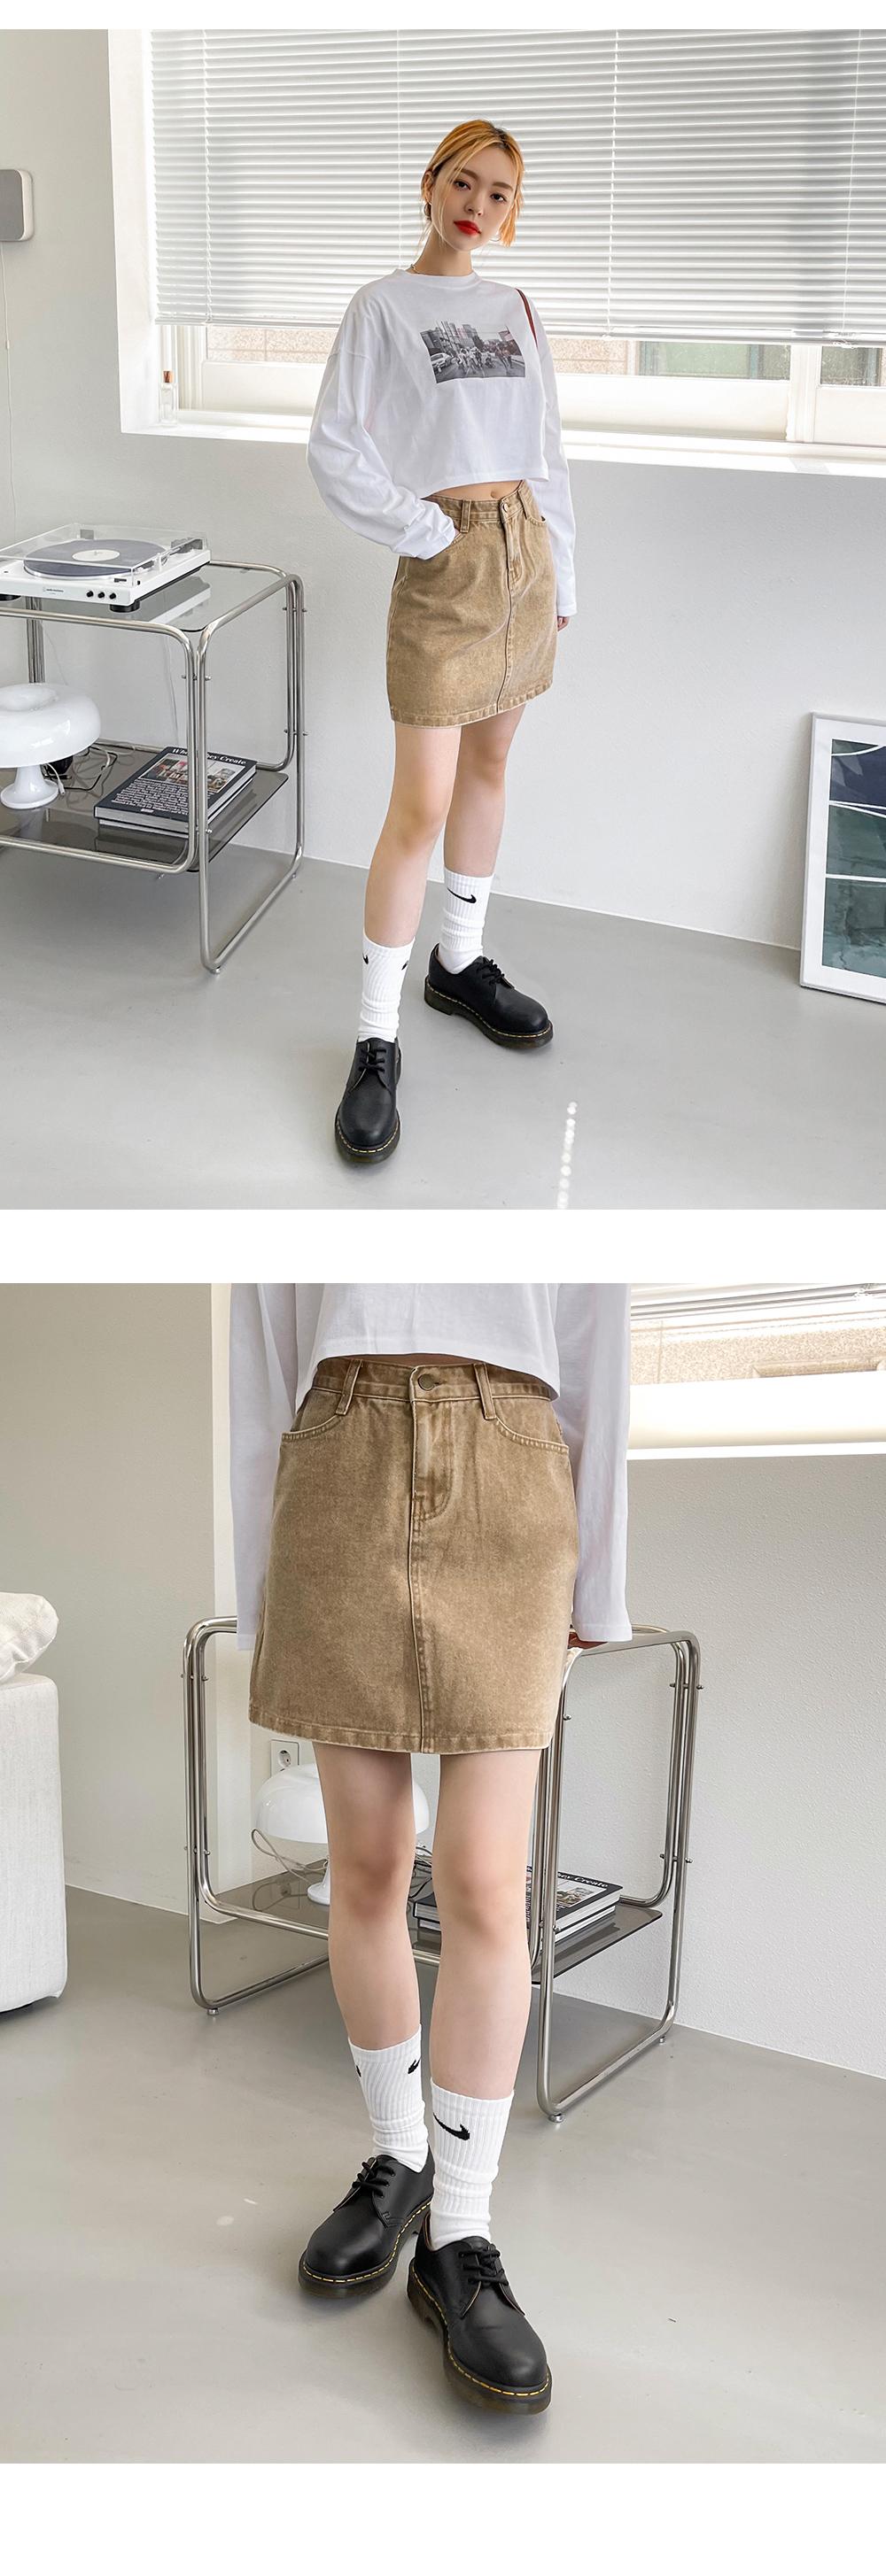 Sword Faded Denim Mini Skirt